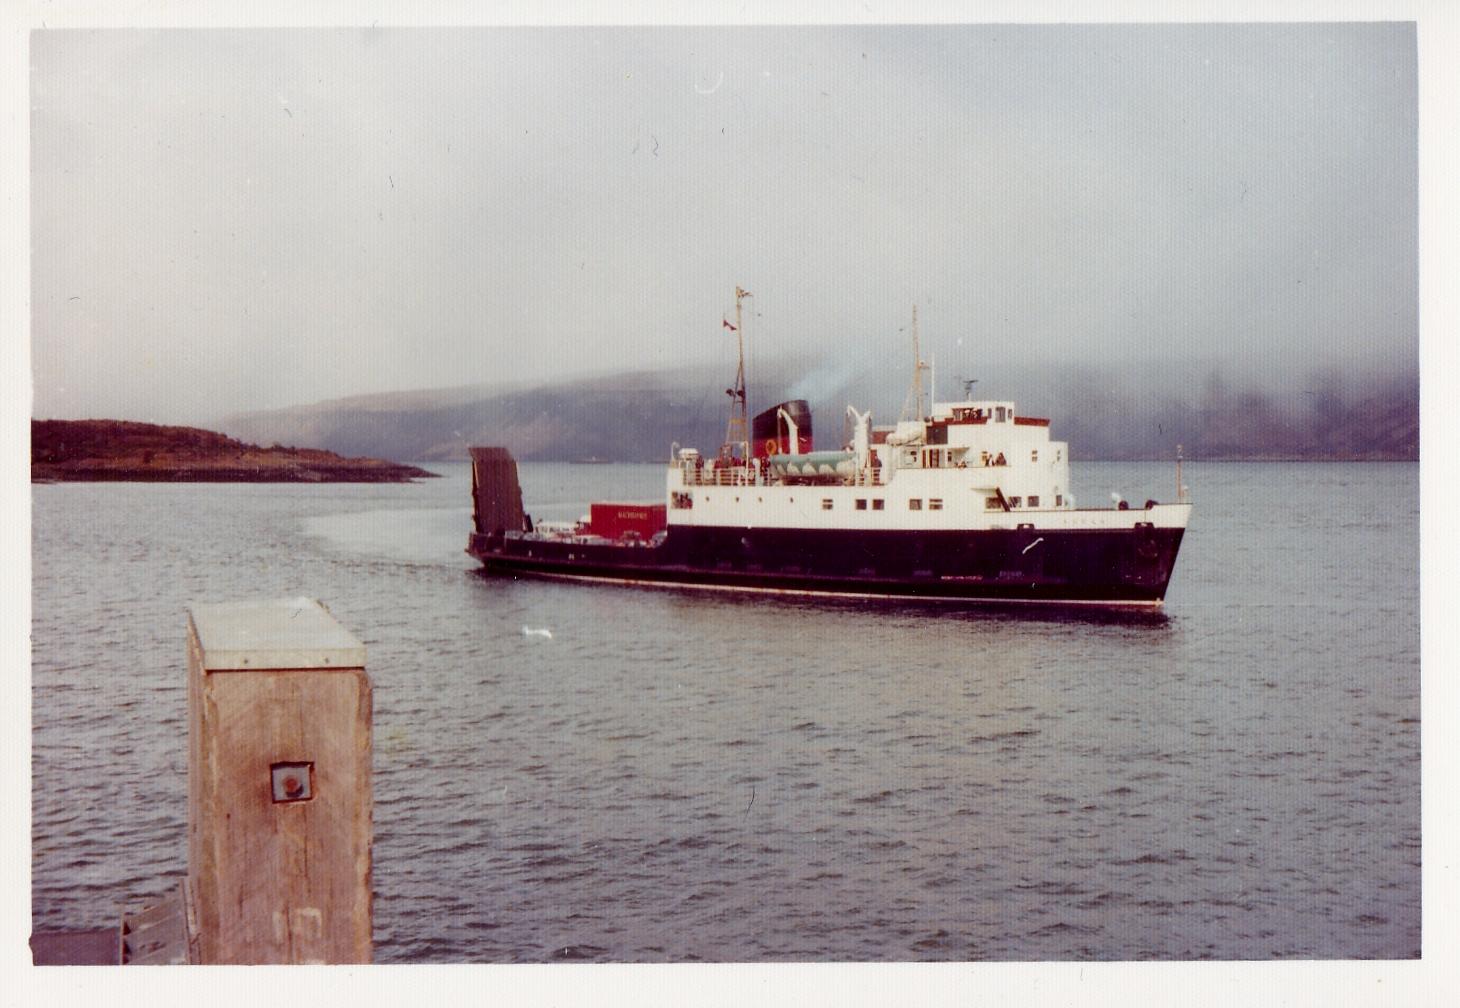 Arran arriving at Craignure (Jim Aikman Smith)